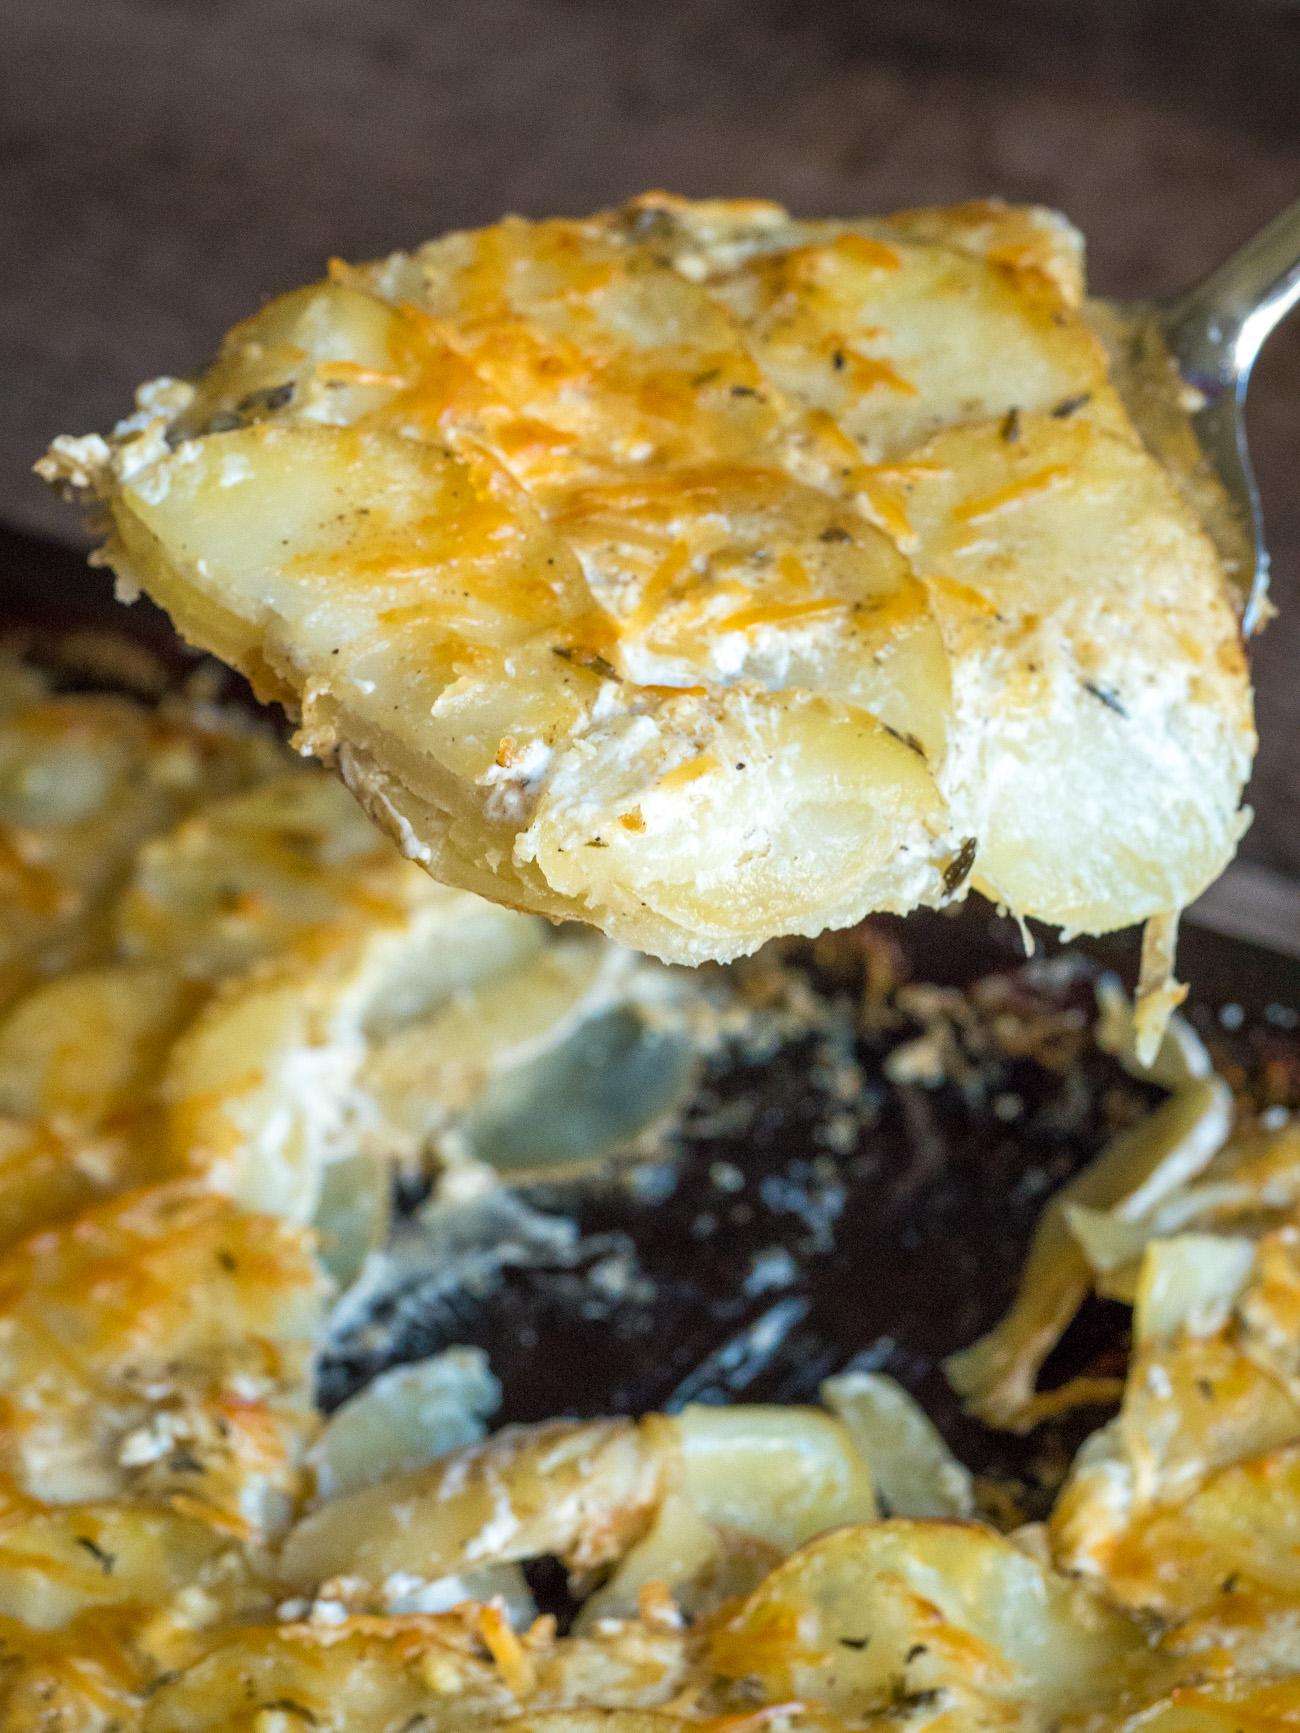 Big scoop of creamy sheet pan potatoes